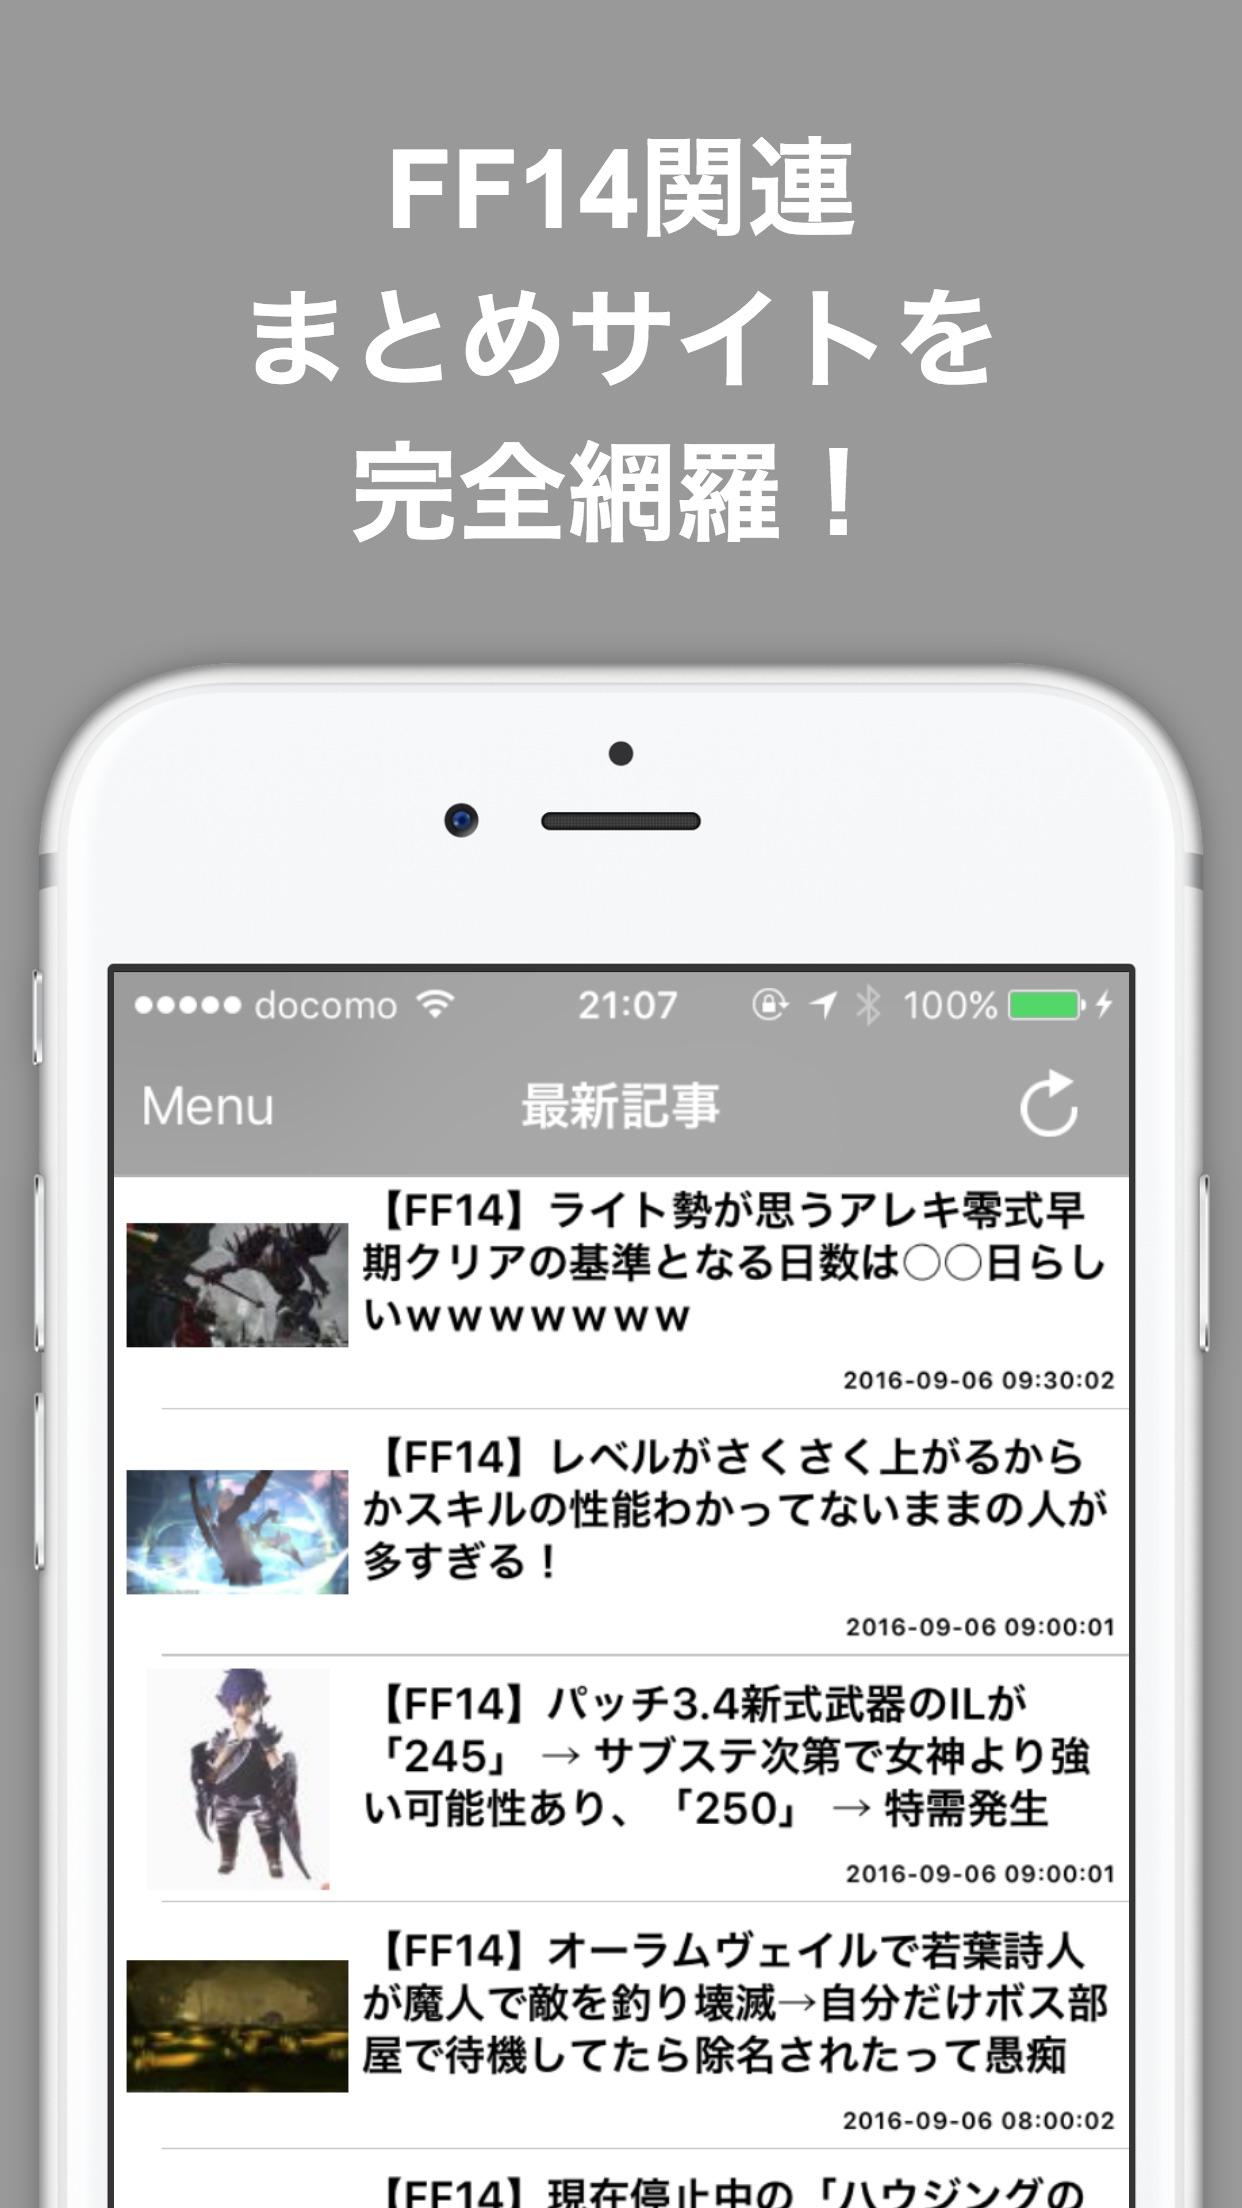 FF14最新ブログまとめニュース for ファイナルファンタジー14 Screenshot